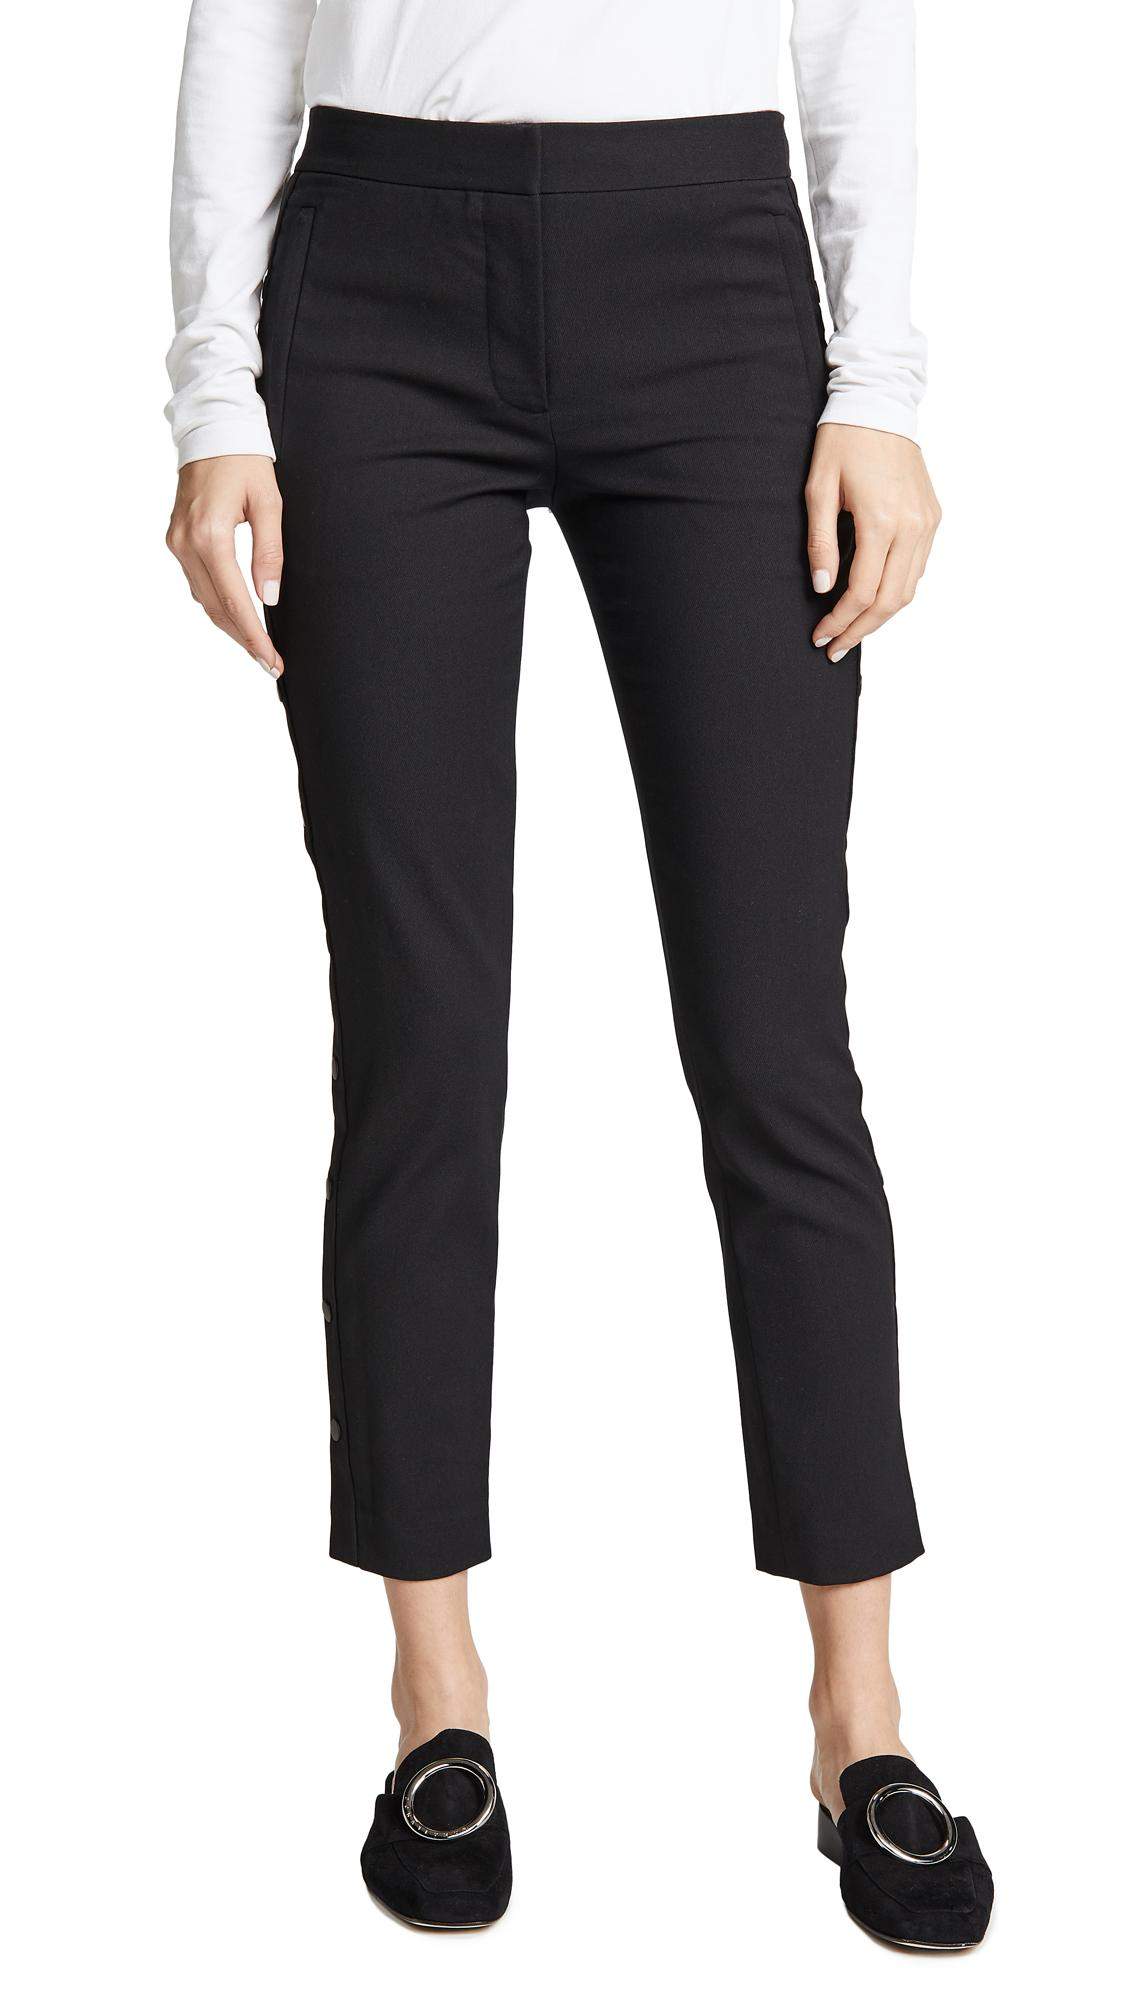 Tibi Cropped Skinny Pants In Black